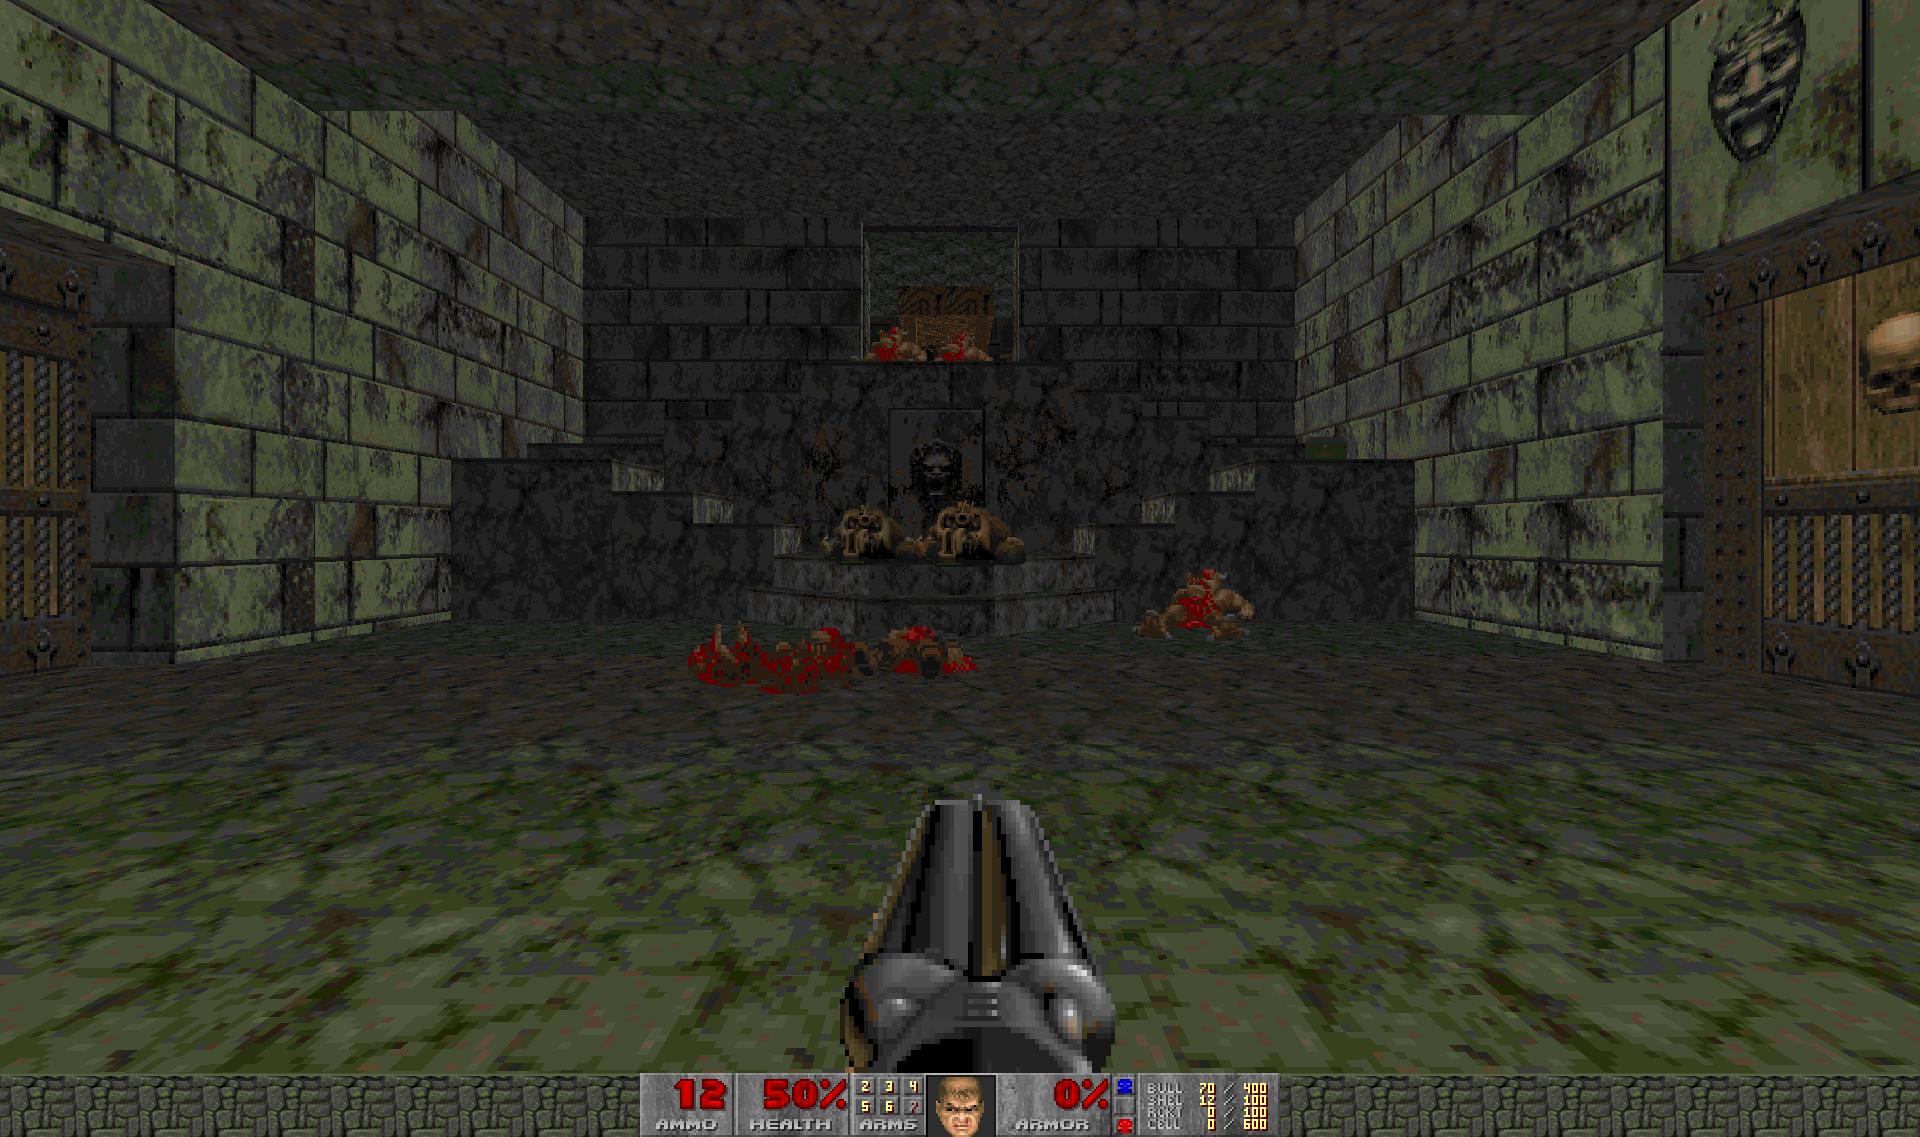 Screenshot_Doom_20210325_130516.png.afc2fd0b929950e29cf9faa17af5ac69.png